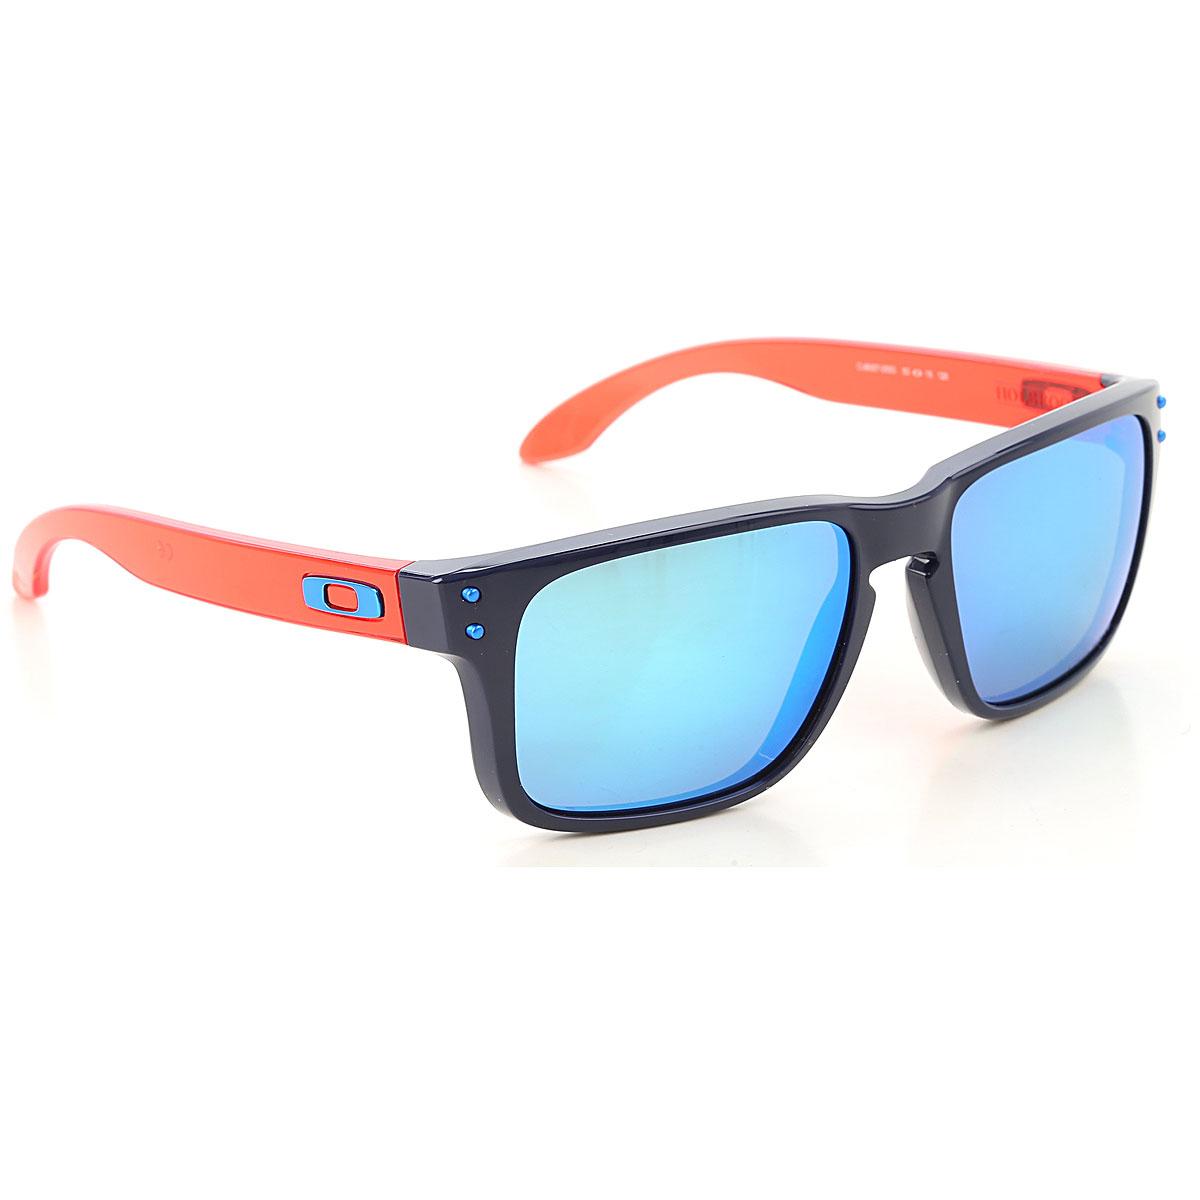 Oakley Kids Sunglasses for Boys On Sale, Transparent Blue, 2019